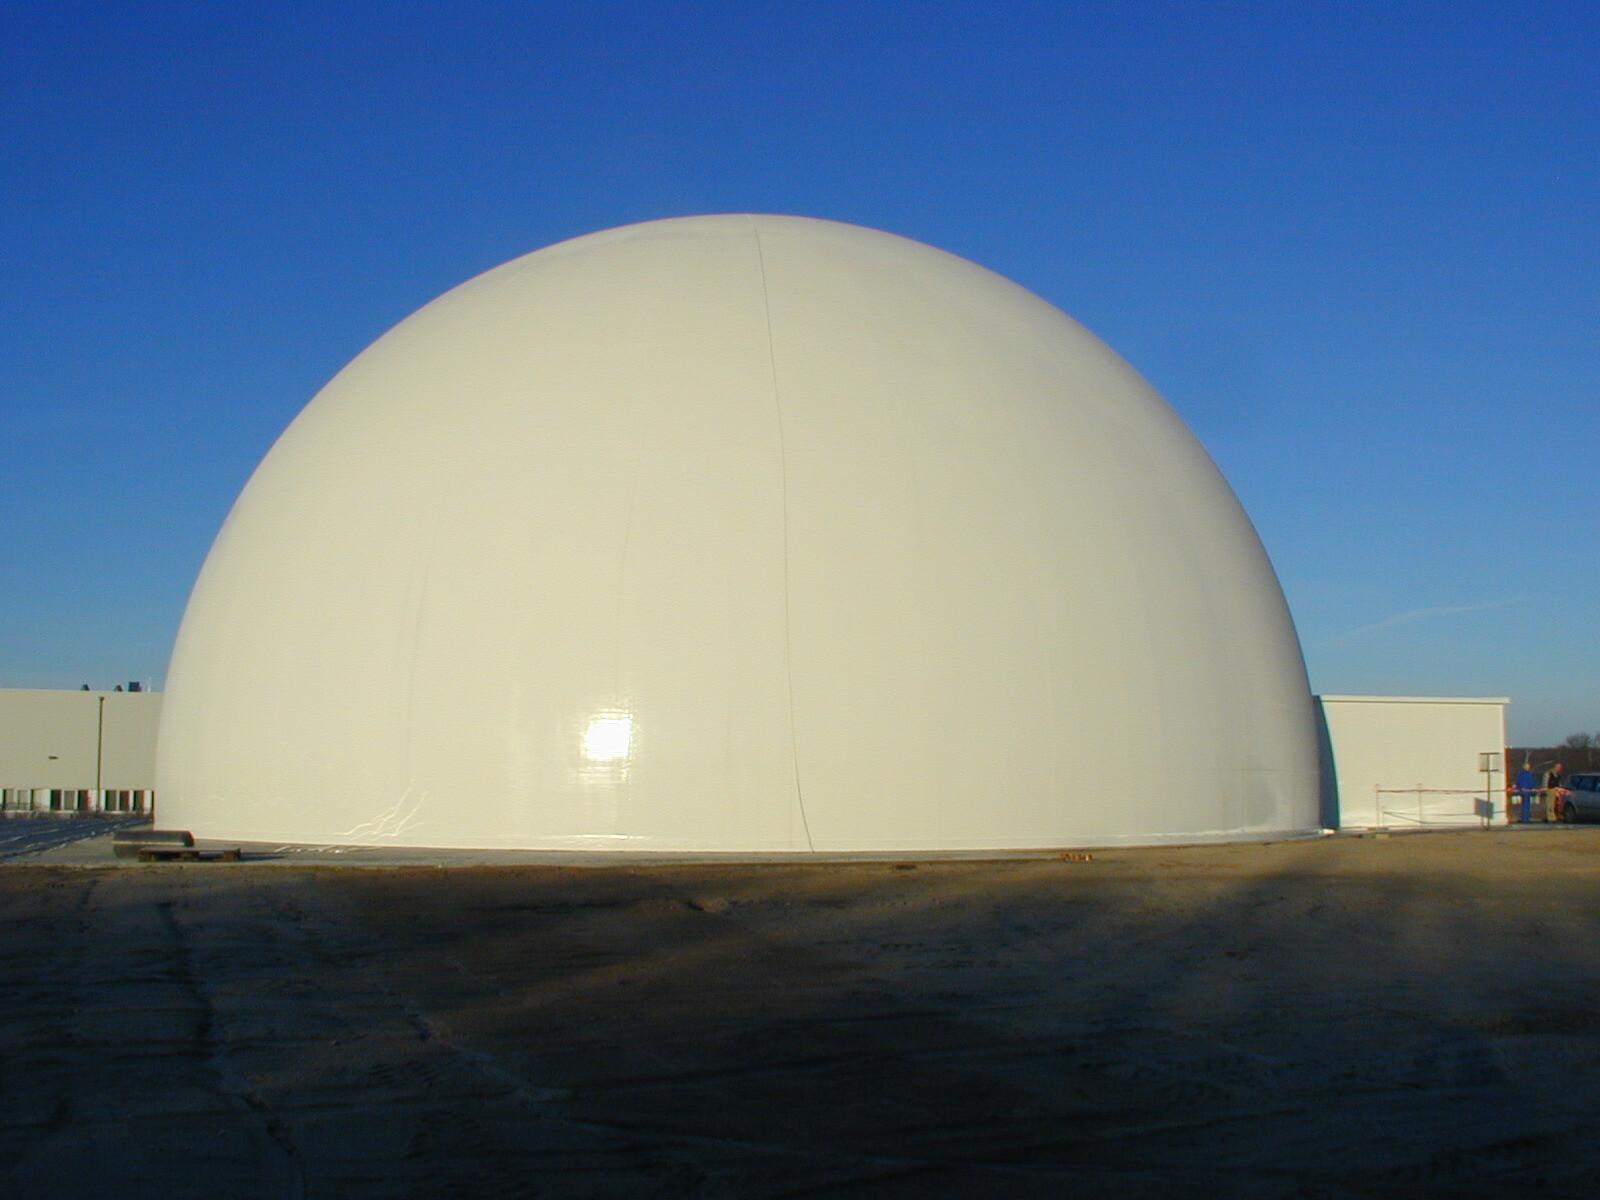 Nippon Antenna RD Center